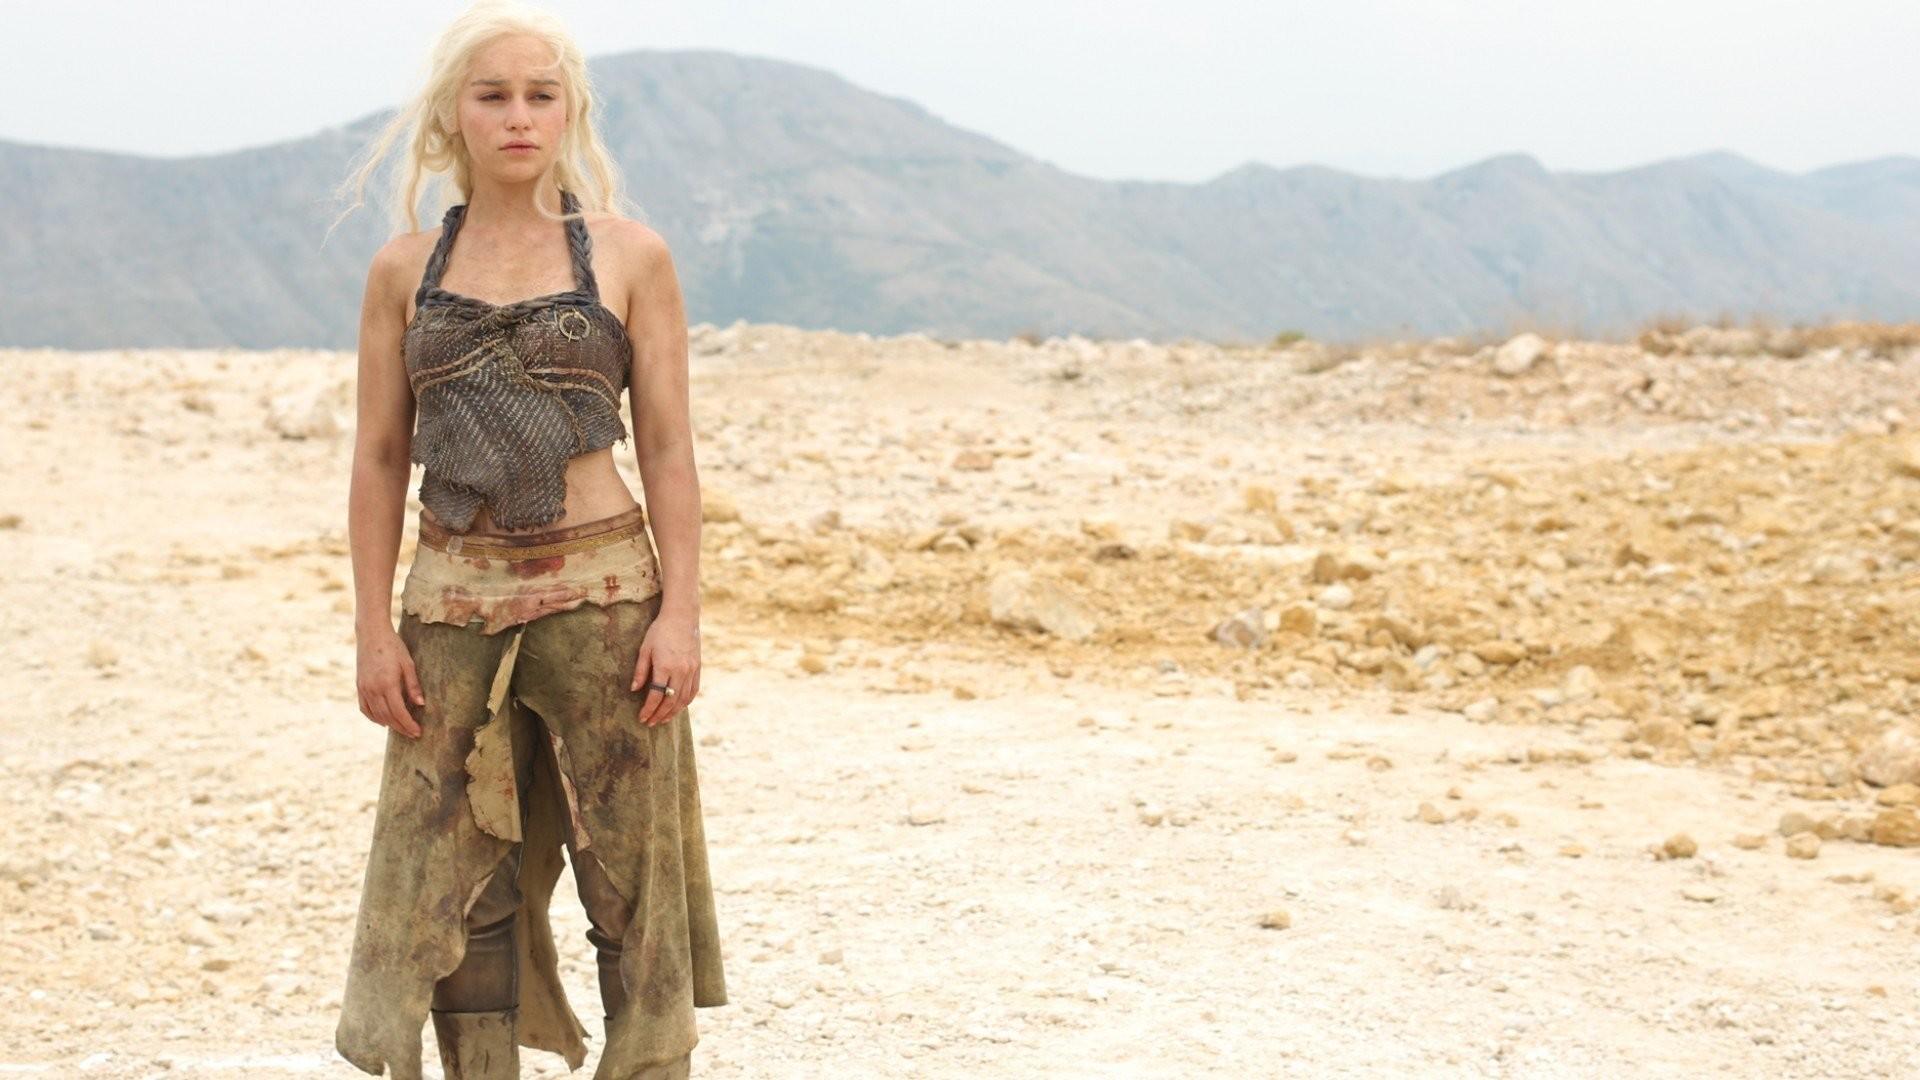 Daenerys Targaryen HD Wallpaper 1920×1080